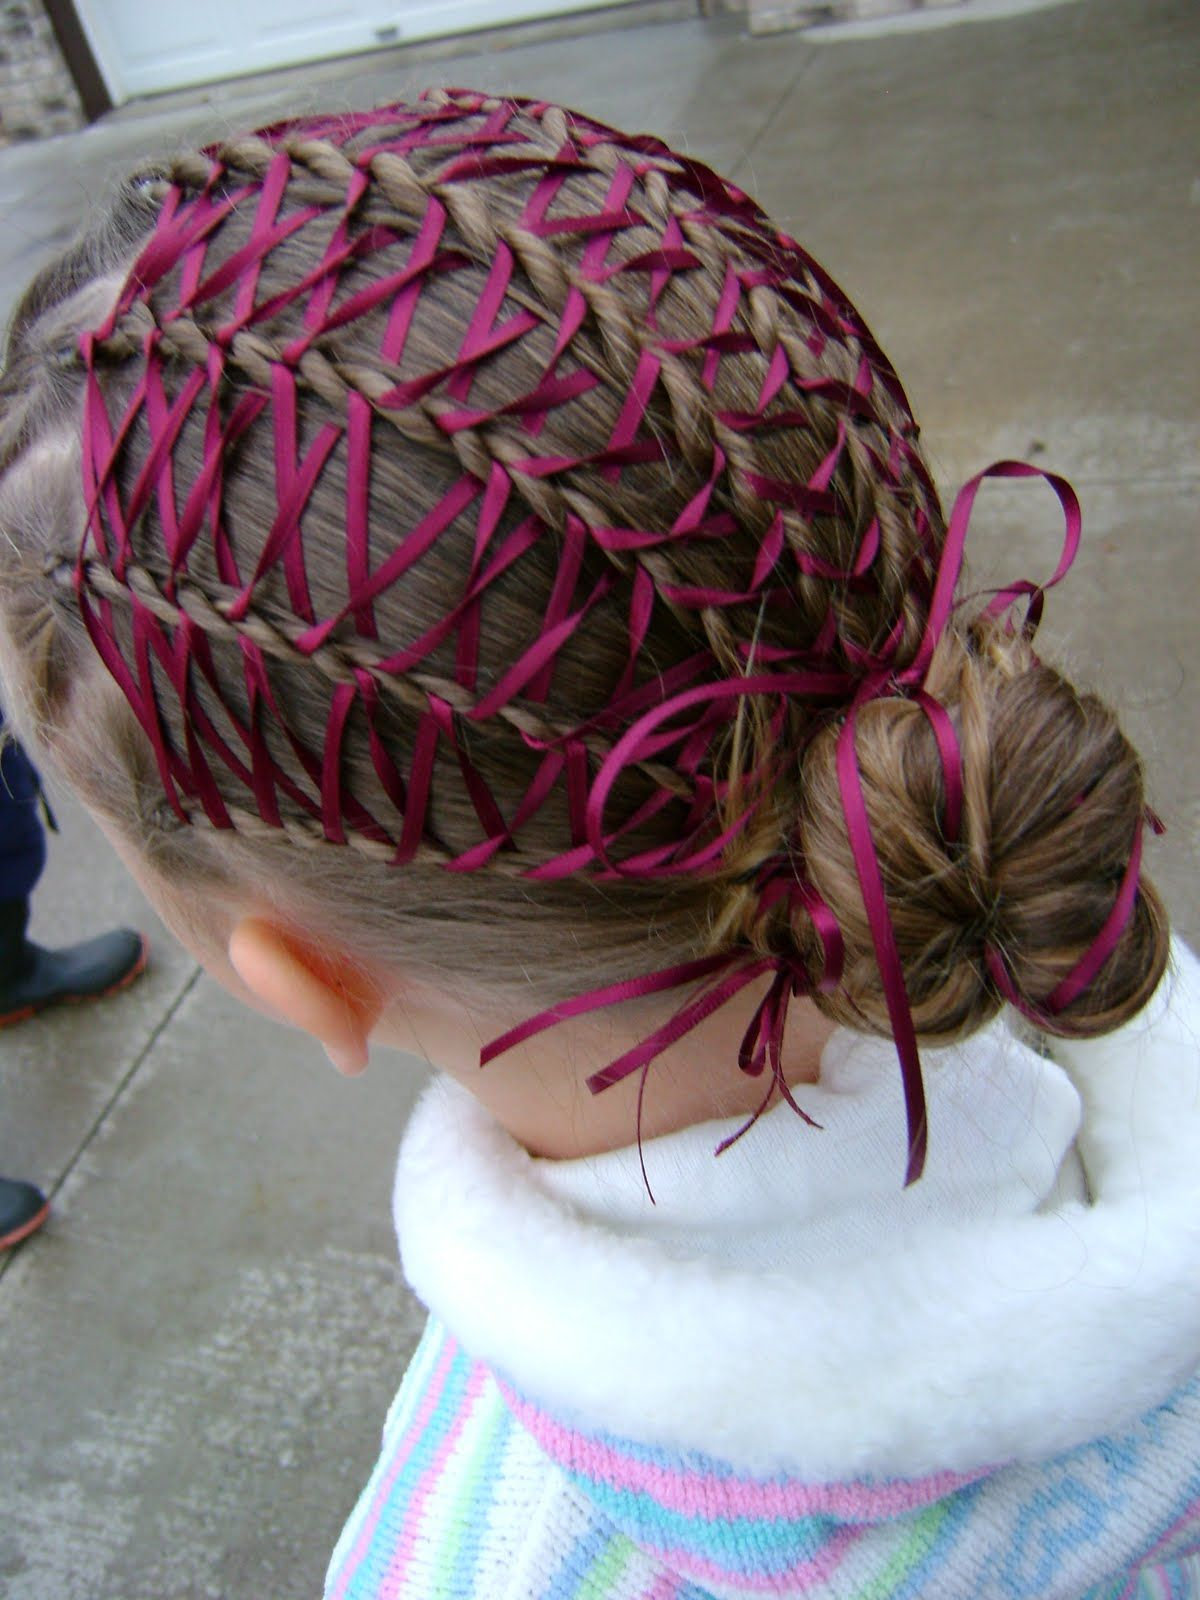 Pin by Cris Lomas on Espyus hairstyles Pinterest Hair Hair